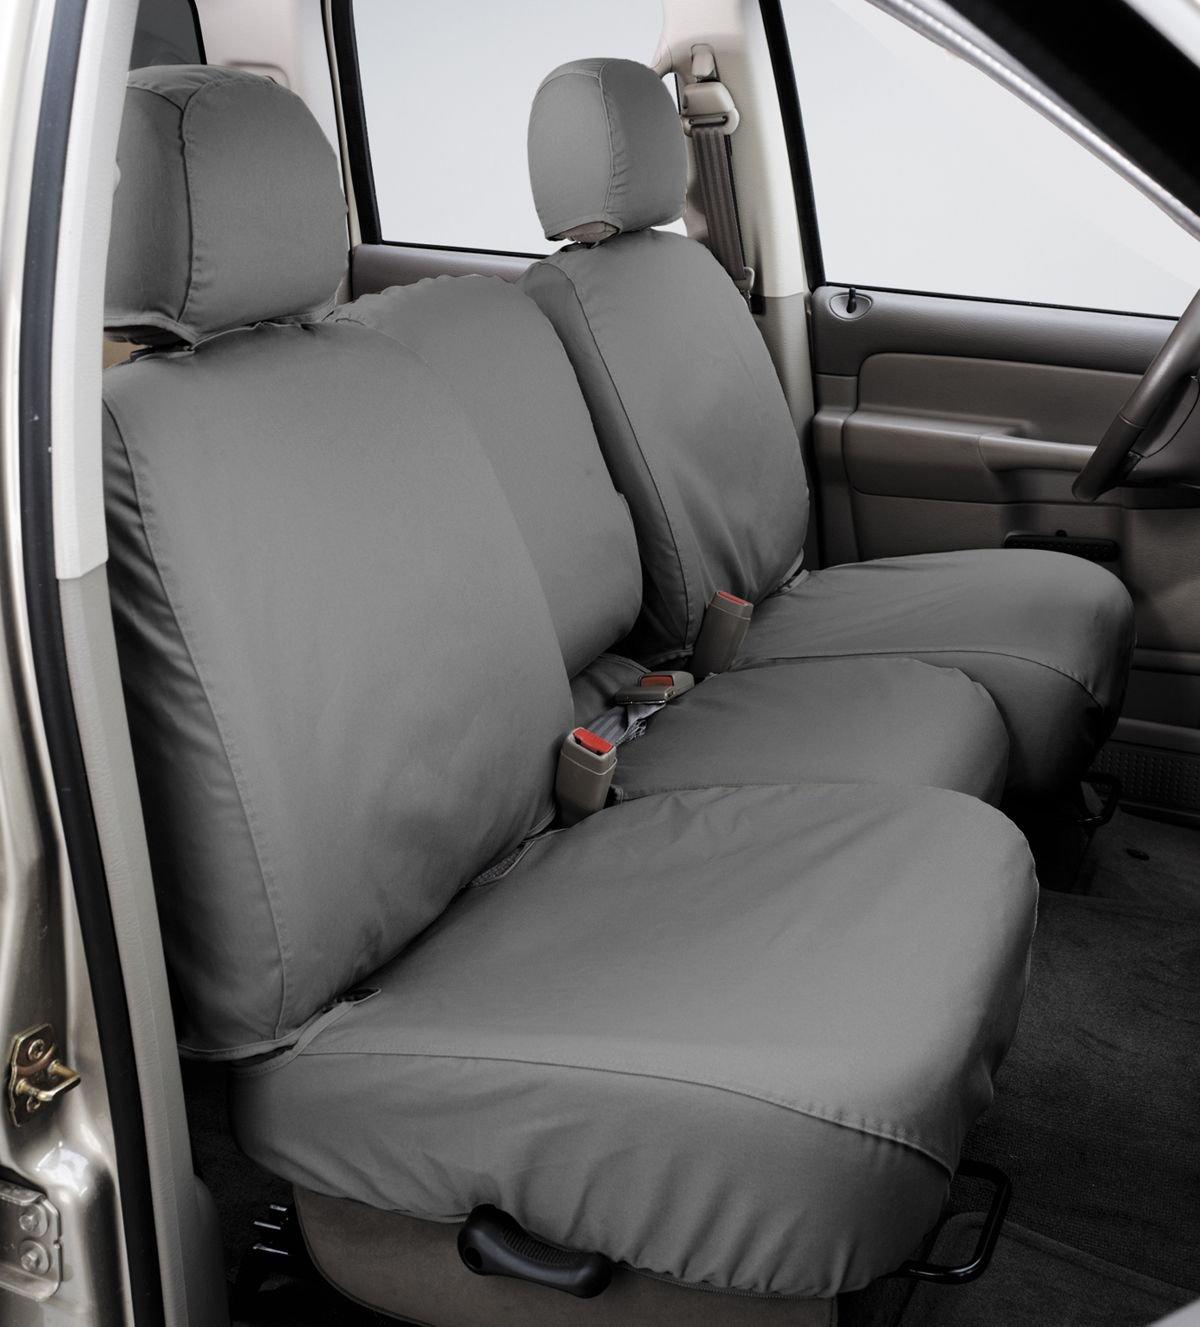 Durafitシートカバー、sn11-v7シートカバートヨタSienna 8のすべての3行Passenger Vanグレーで自動車ベロアB00QKWBB5K--